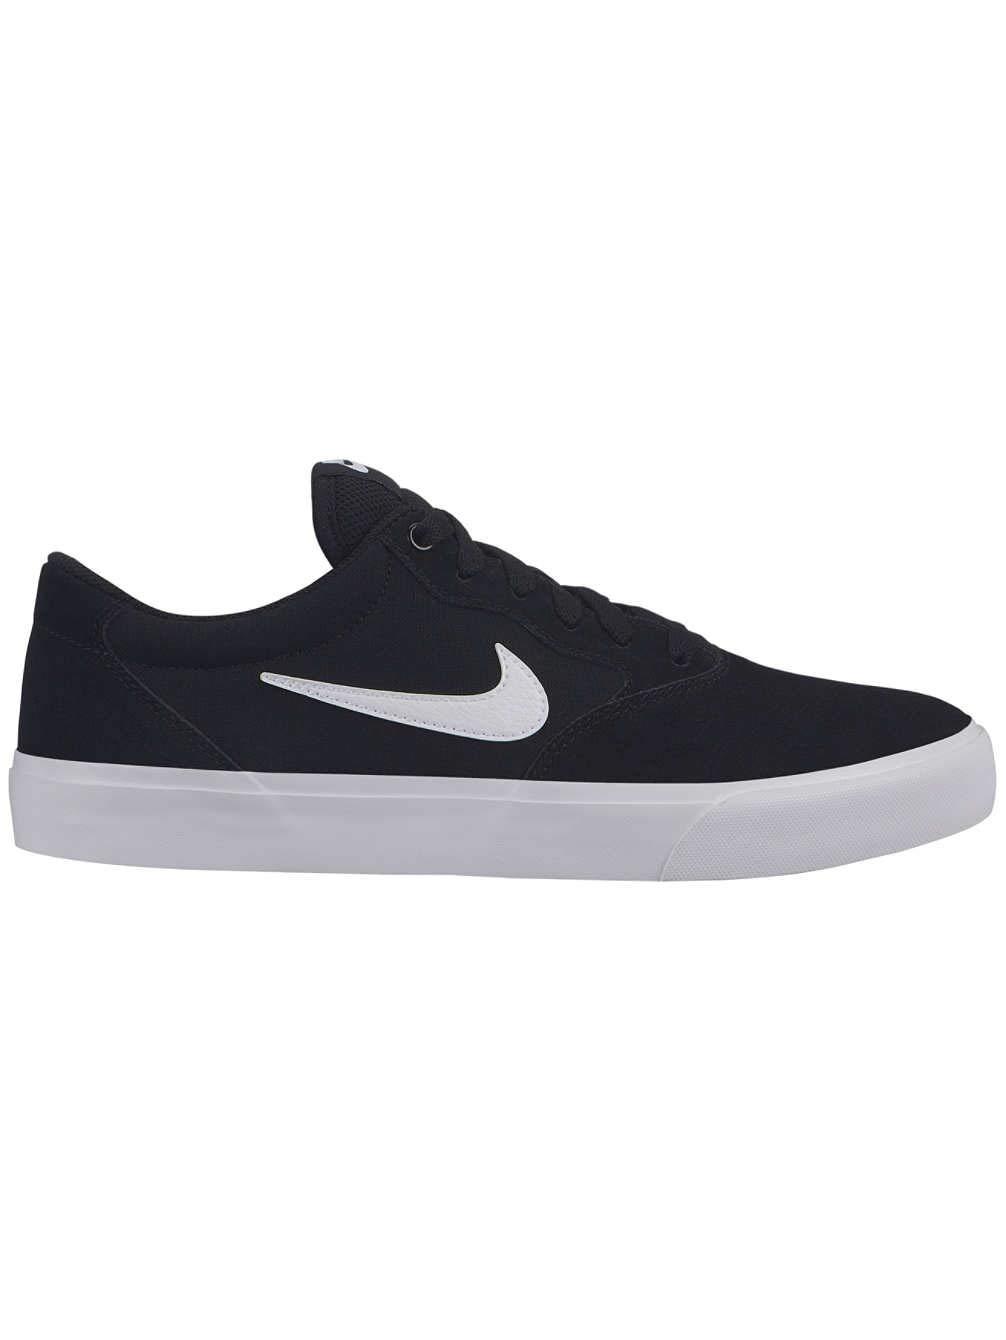 Nike Skate Shoe Men SB Chron SLR Skate Shoes